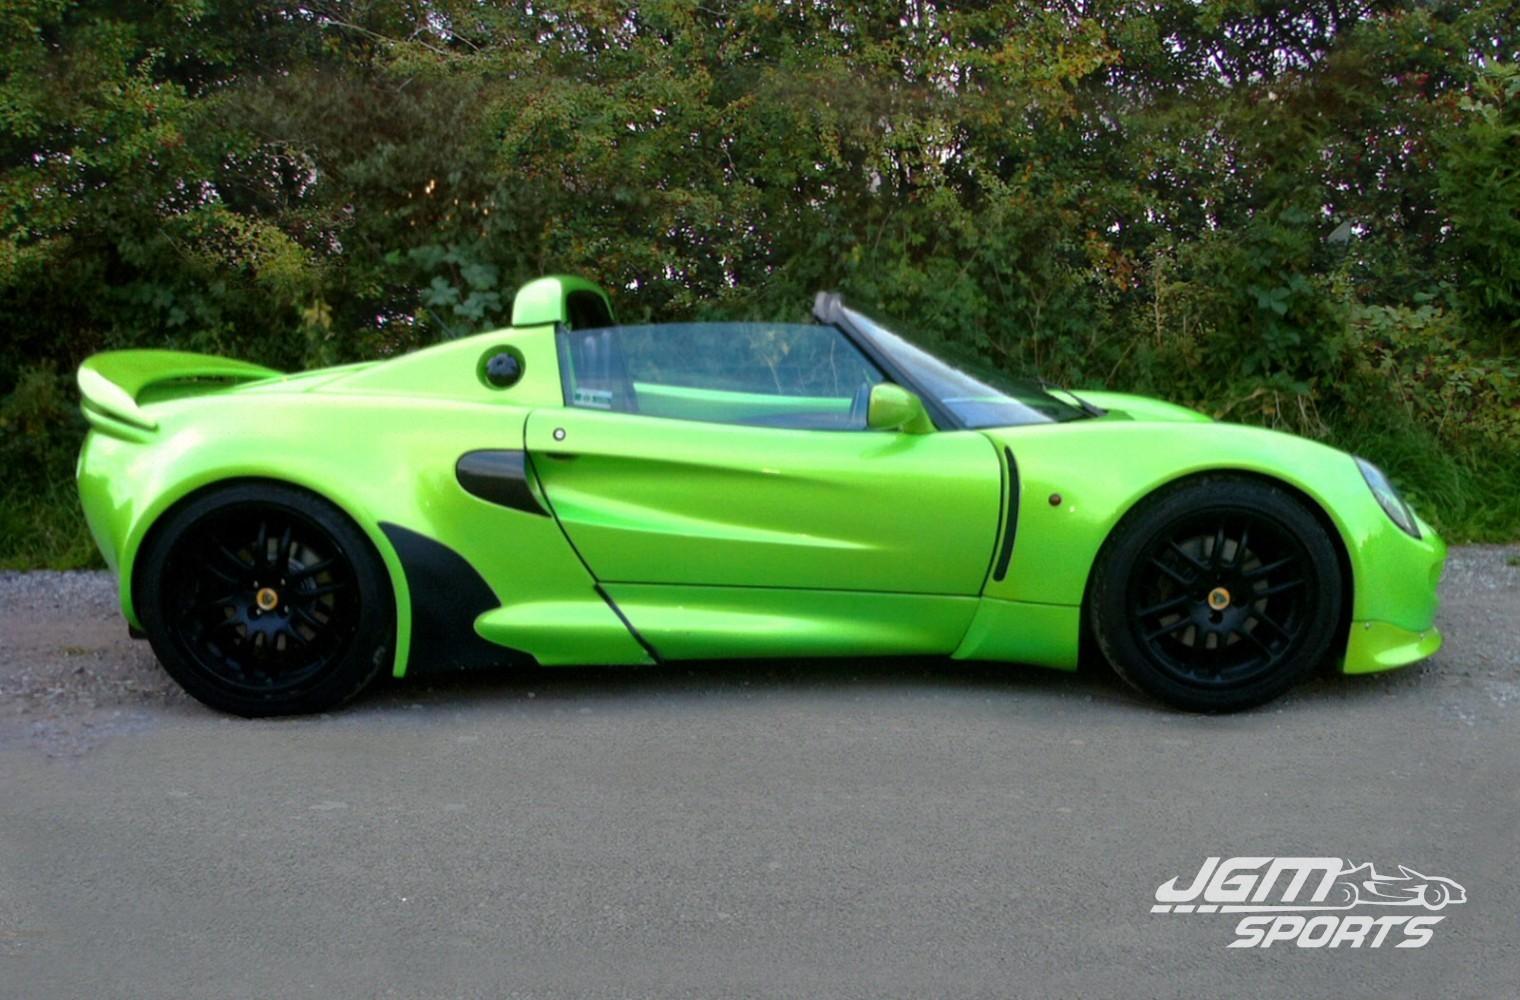 1999 S1 LOTUS ELISE CUSTOM CAR WIDE ARCH VVC ENGINE › JGMsports